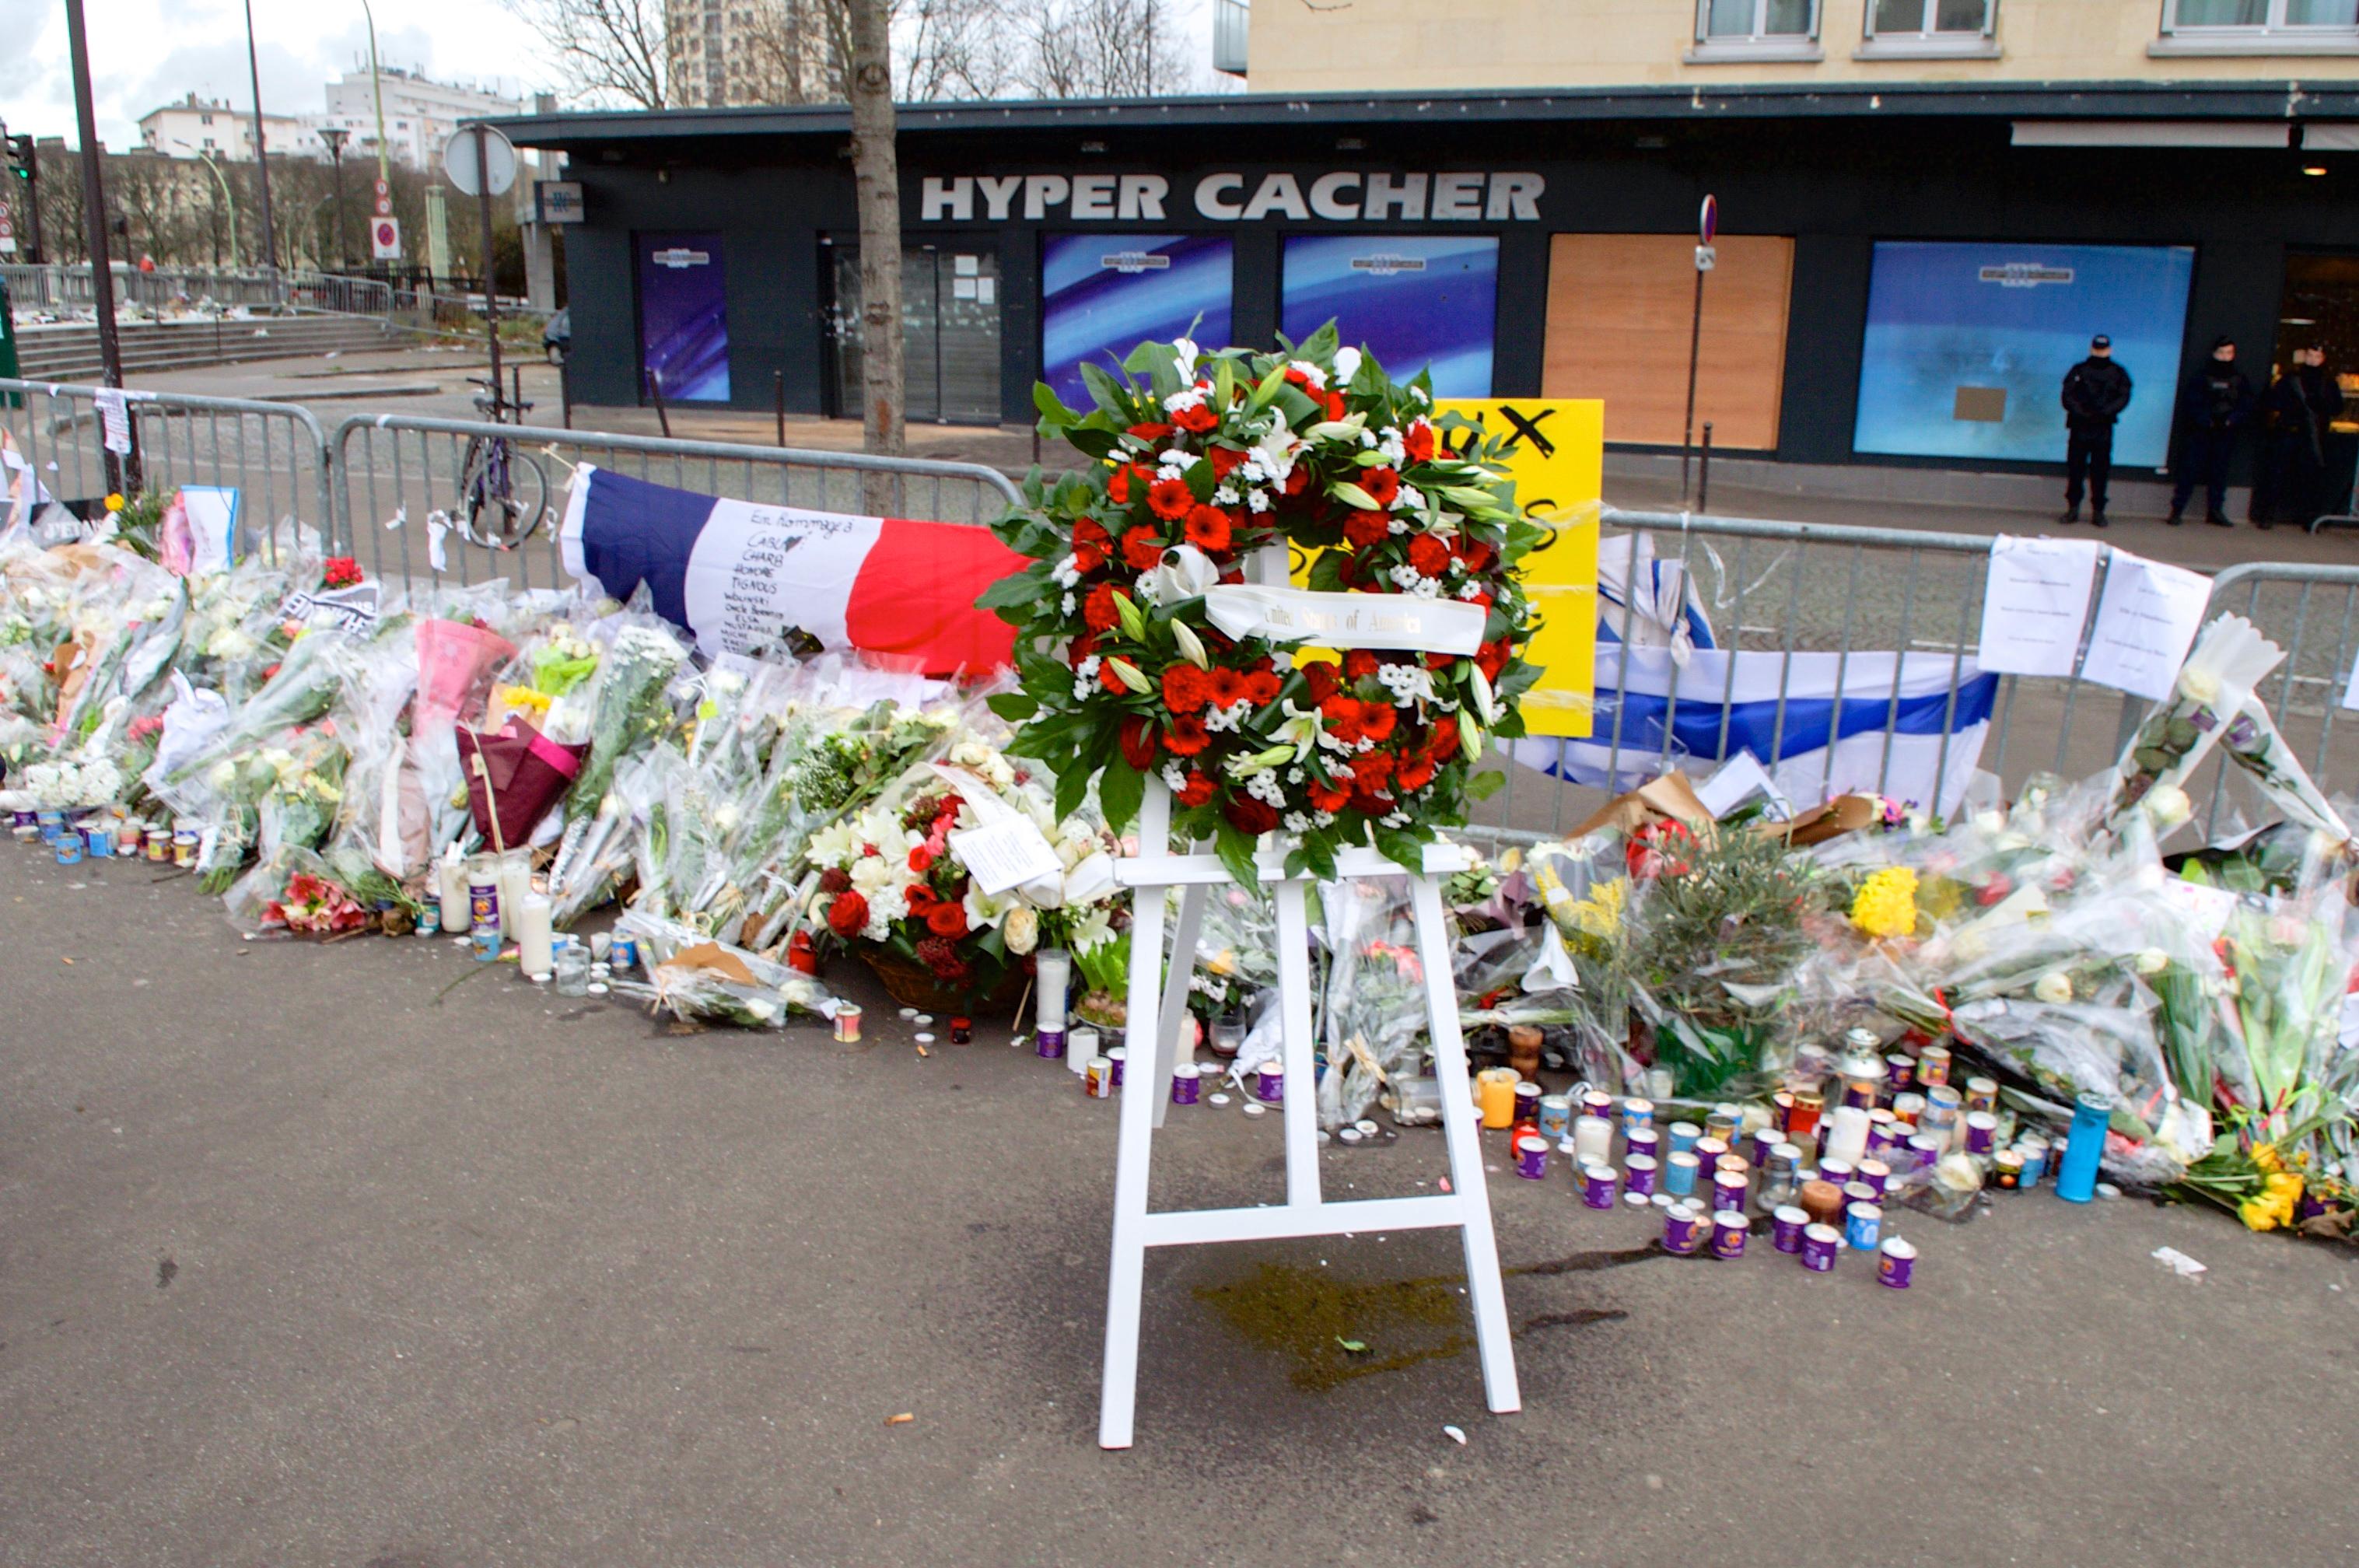 Muslims Disrupt Destroy Christmas Market In Belgium 2020 Islamic terrorism in Europe   Wikipedia